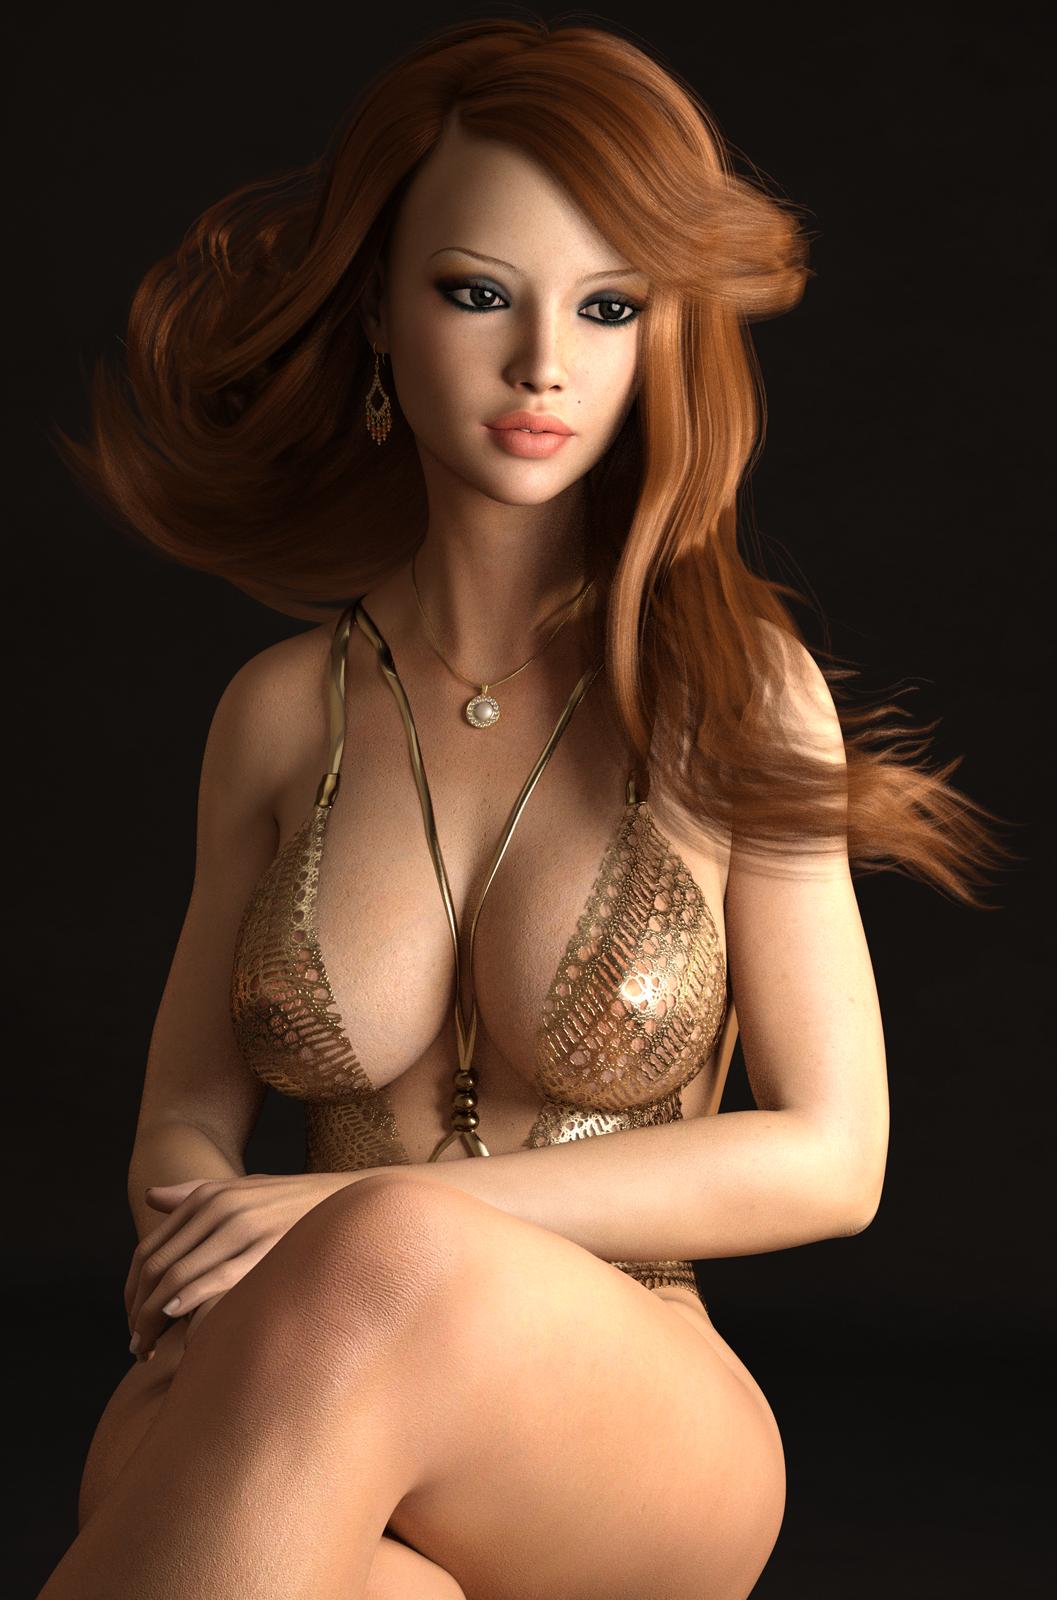 Erotic poser girl models